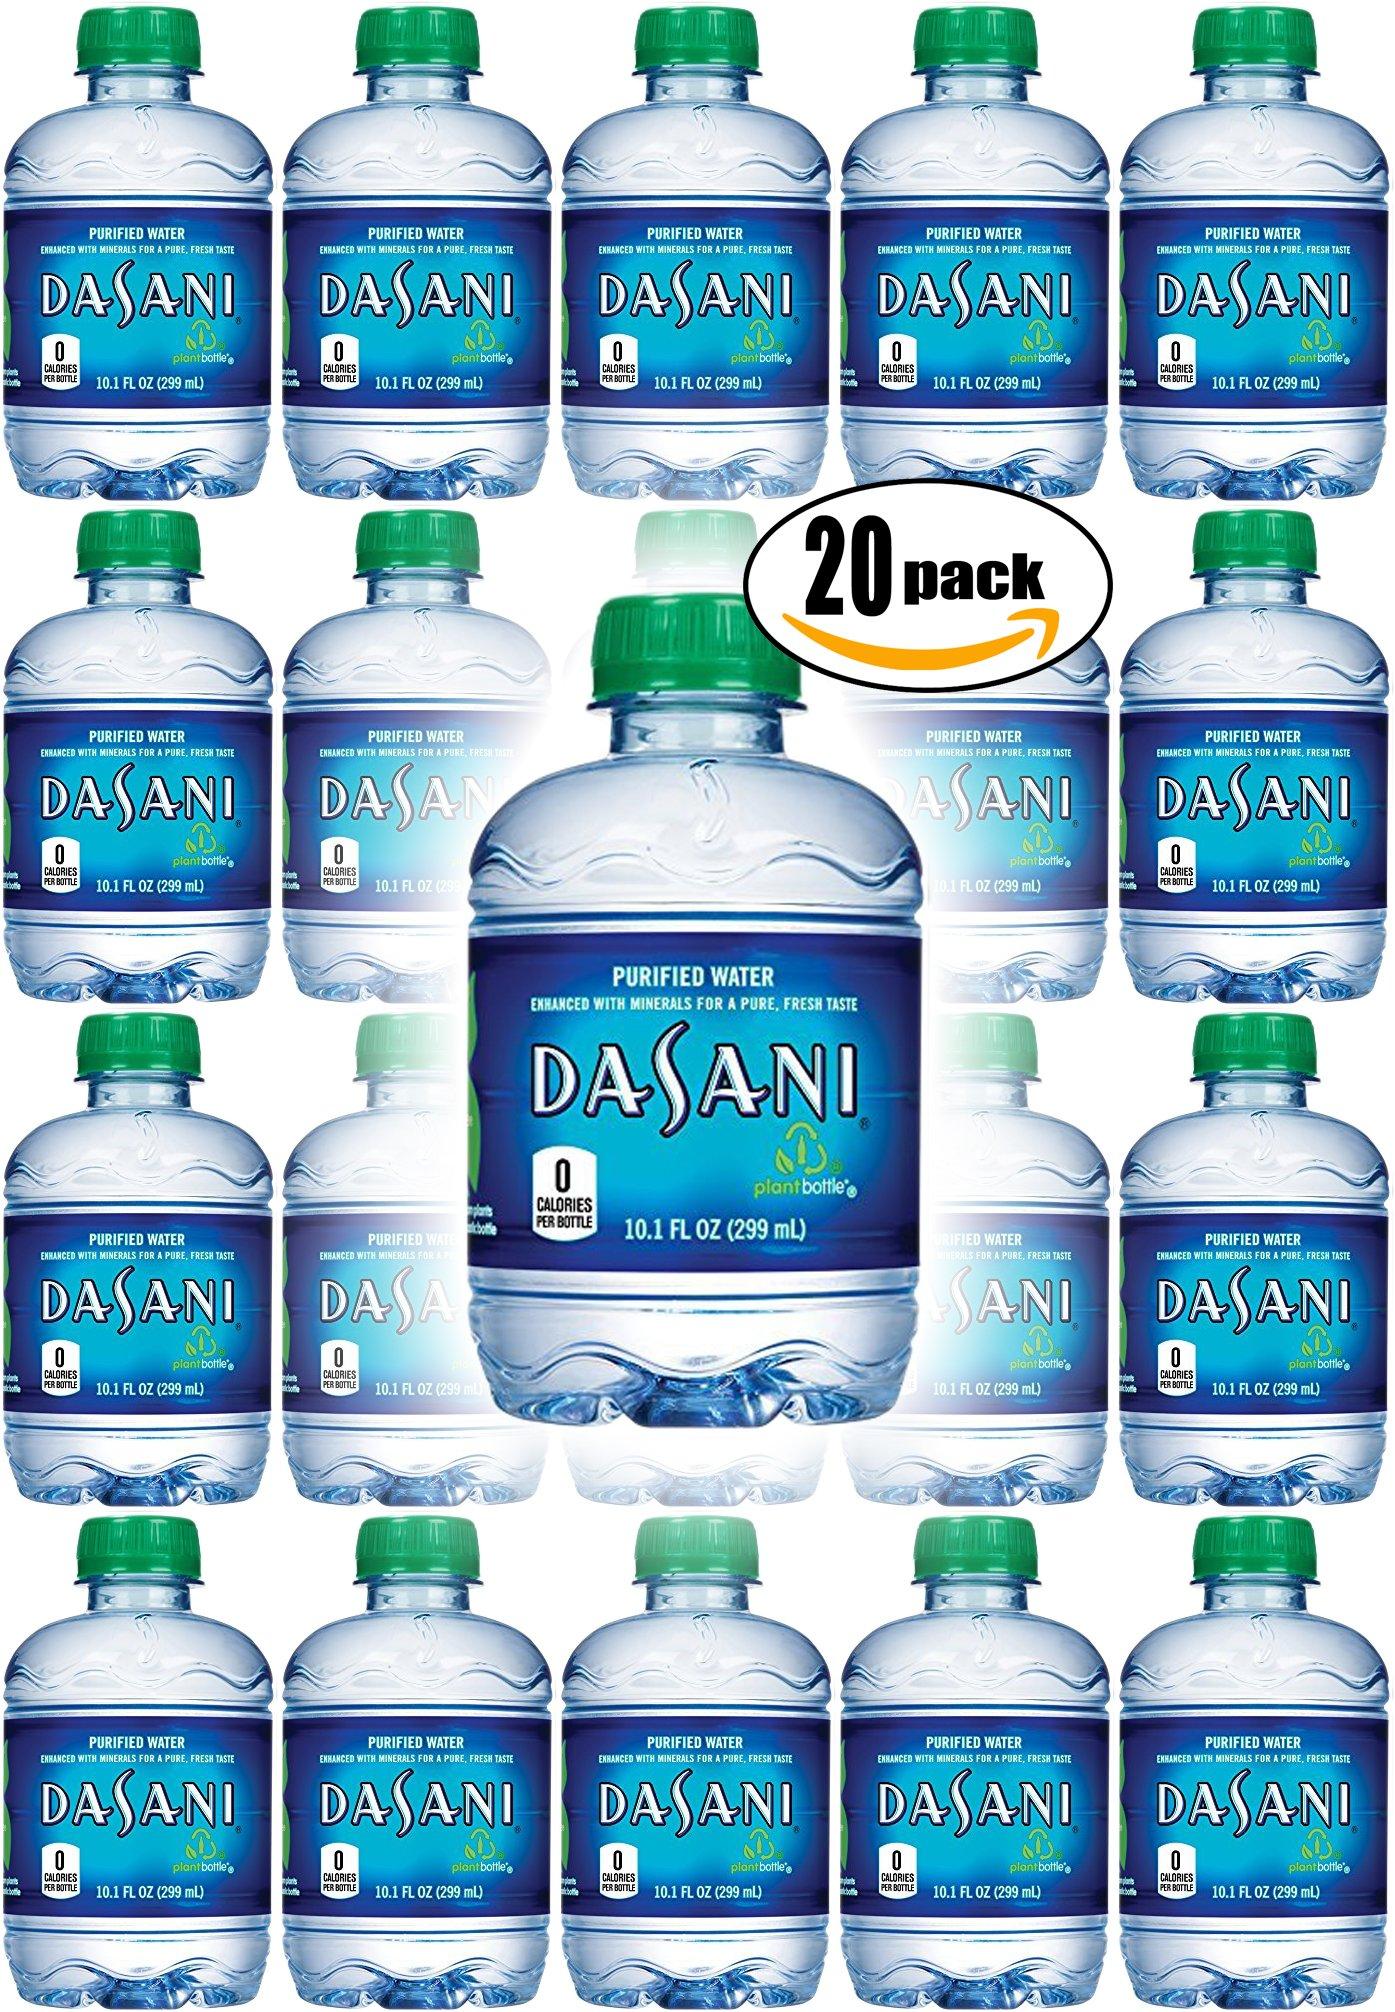 Dasani Purified Water, 10 Fl Oz (Pack of 20, Total of 200 Fl Oz) by Dasani